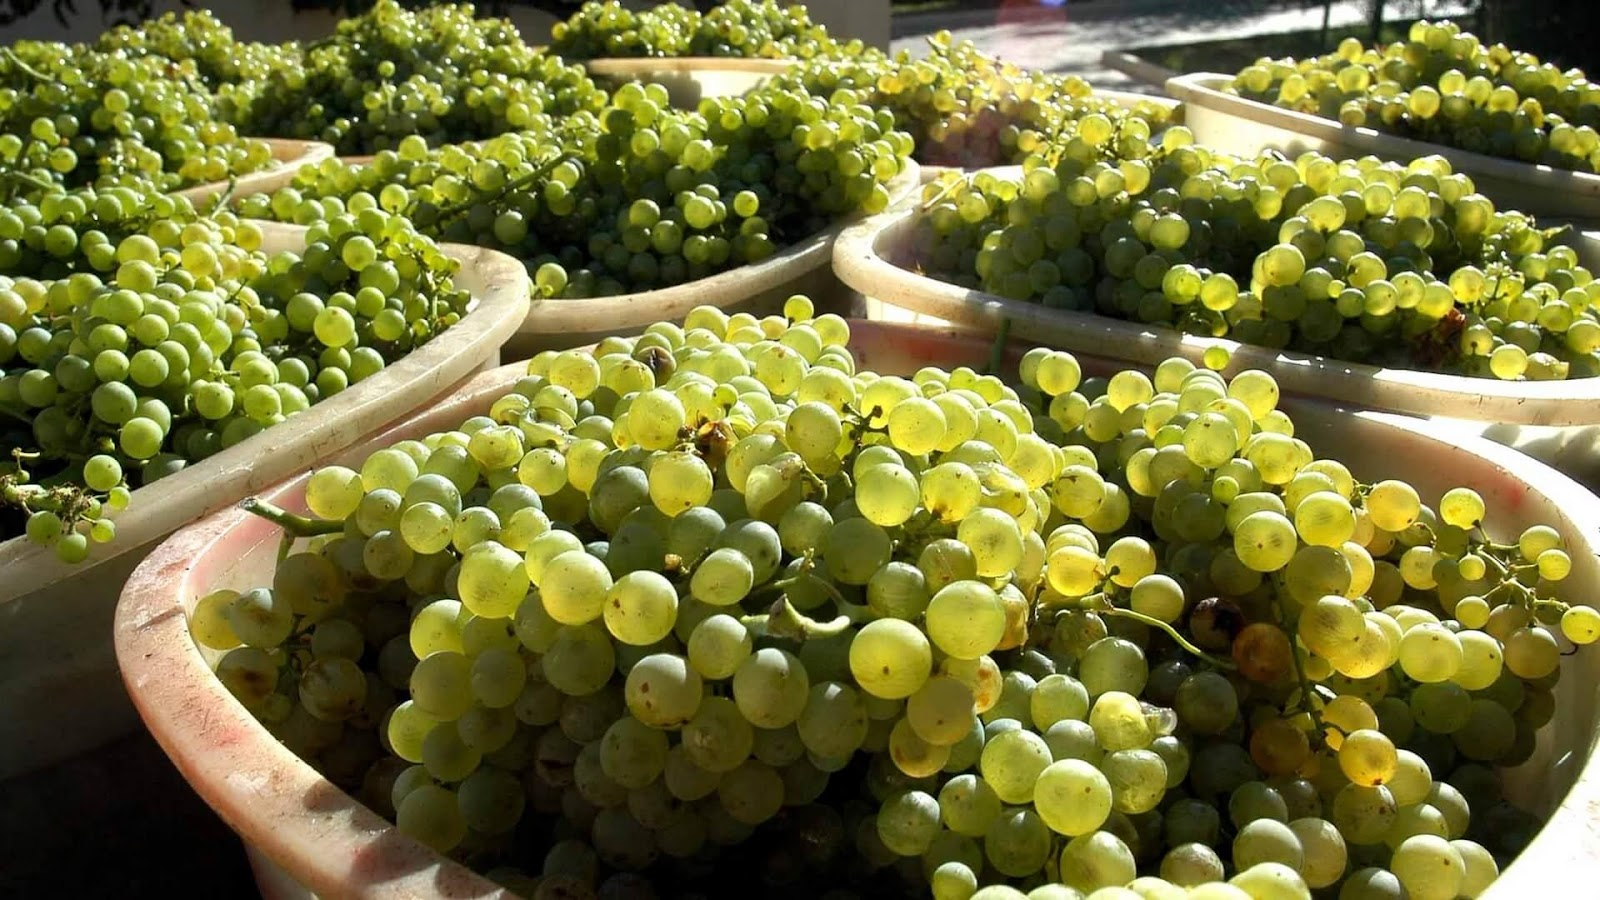 https://winetouritalia.com/wp-content/uploads/2016/11/31-Trebbiano-1.jpg